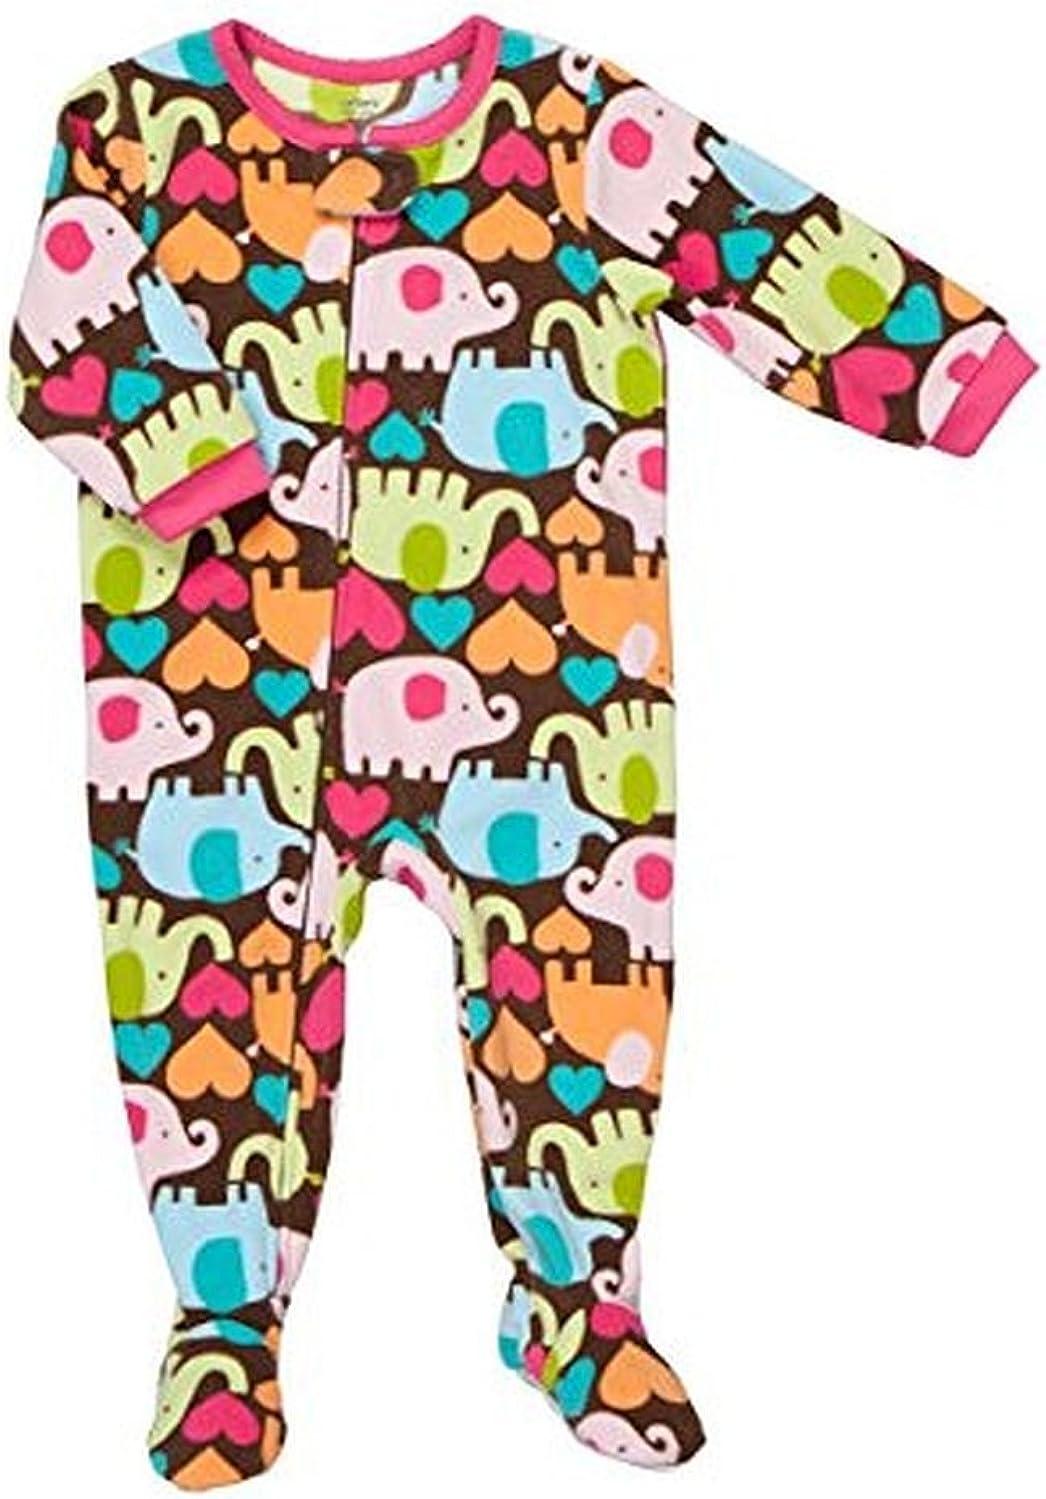 Carters Girls 3T Elephant and Heart Print Fleece Footed Pajama Sleeper